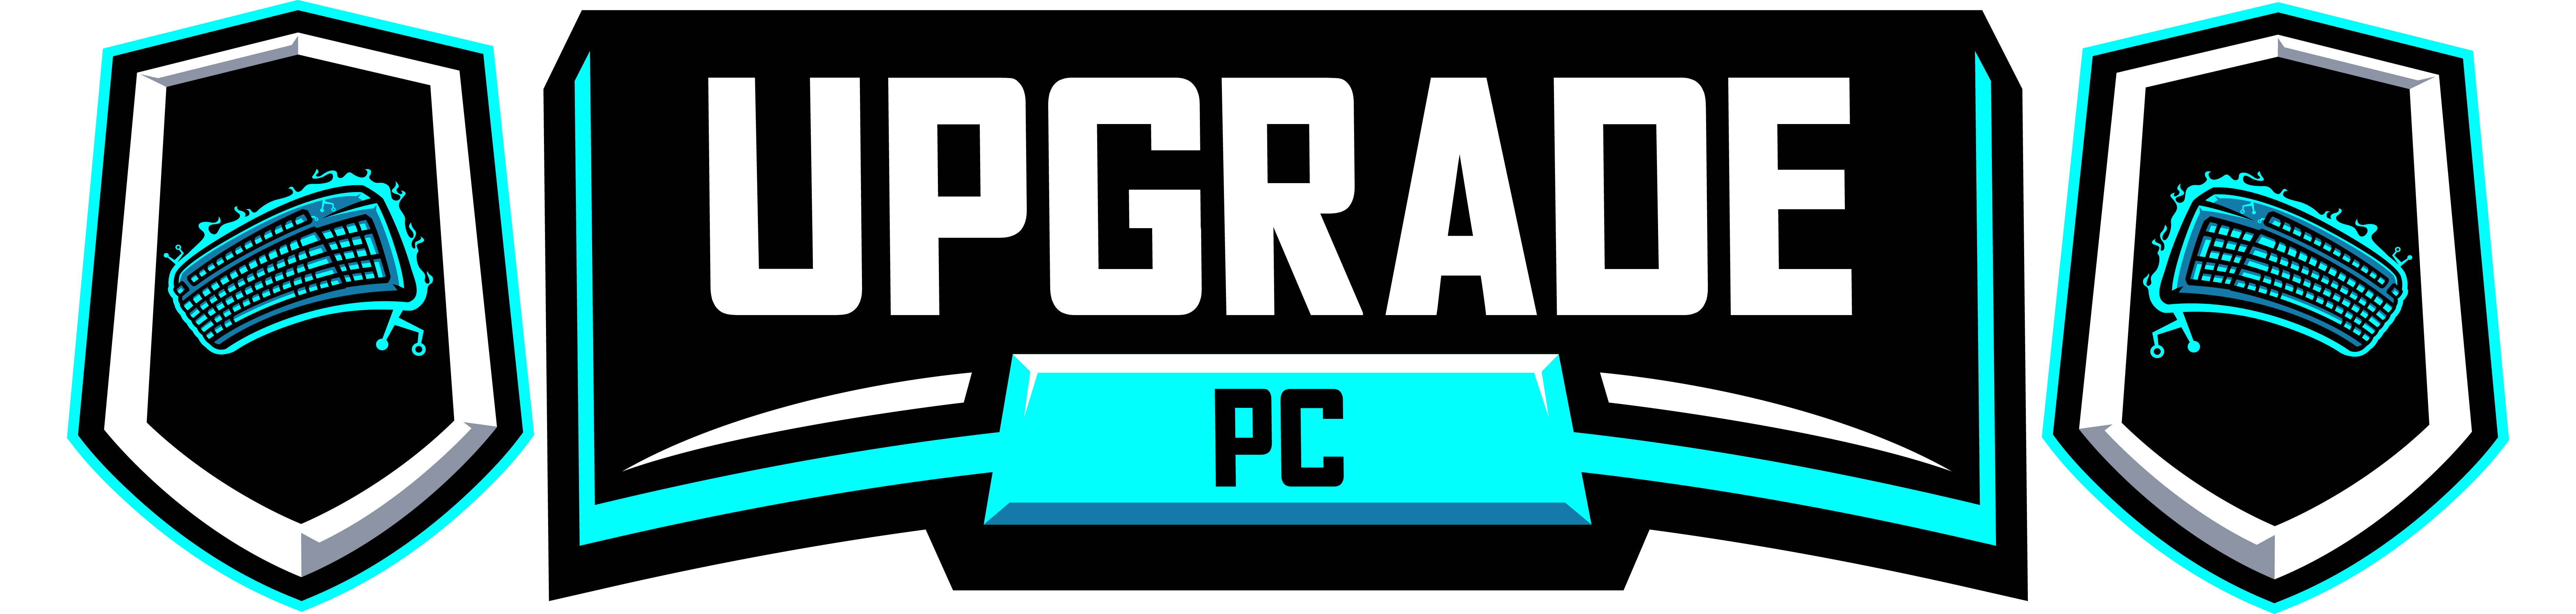 Upgrade – PC Webshop